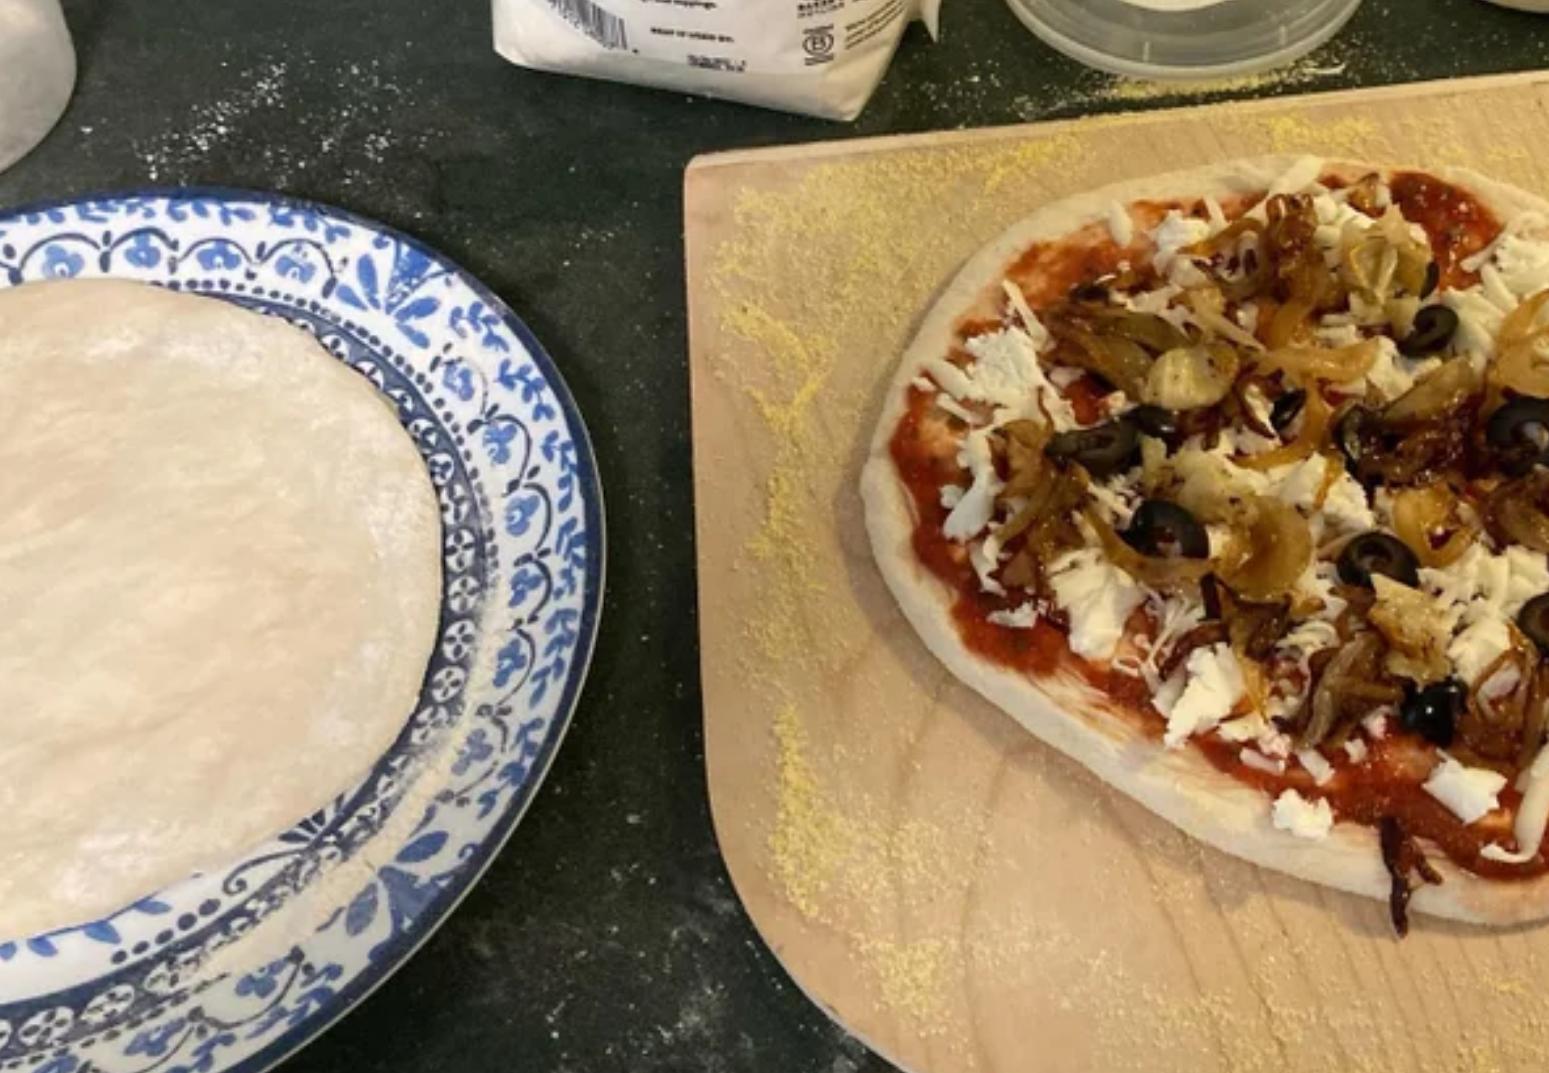 ooni pizza oven pizza prep